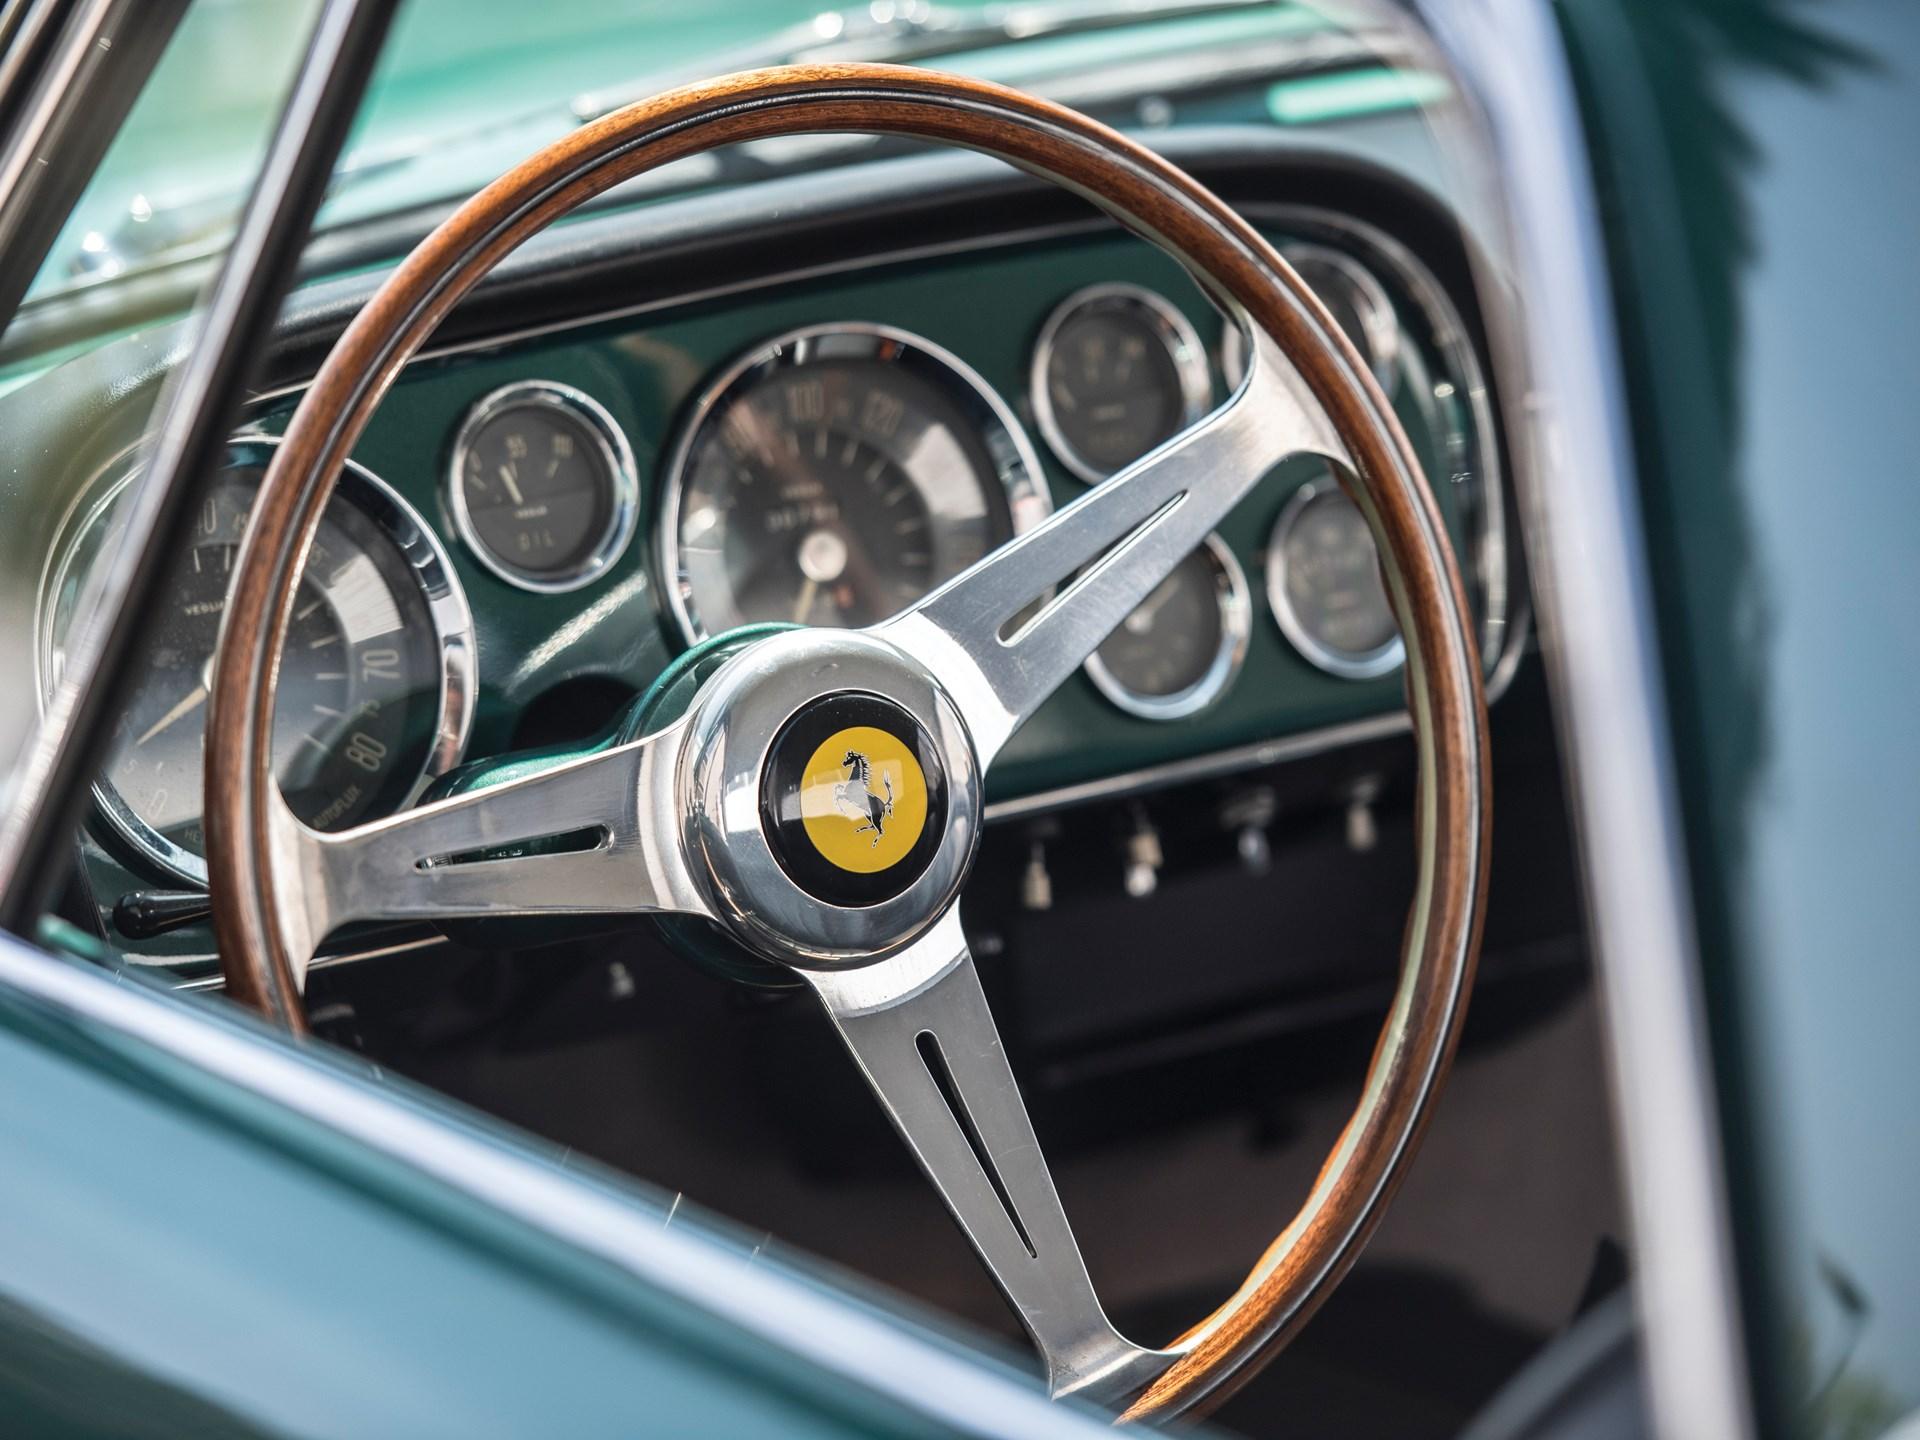 1959 Ferrari 250 GT Coupe by Pinin Farina